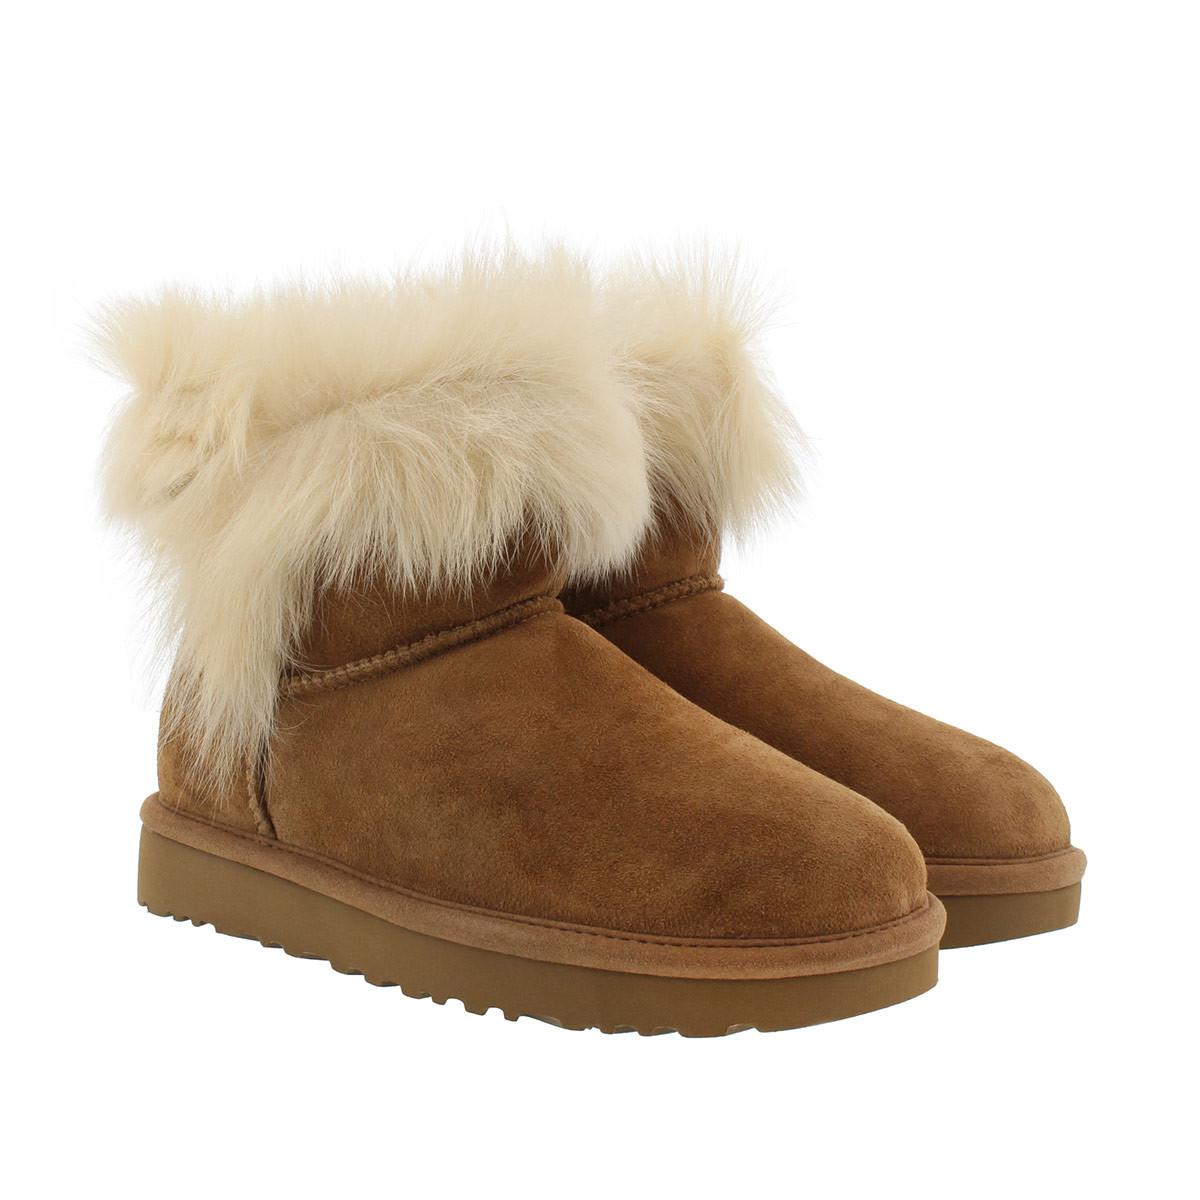 Topp Kvalitet For Salg Boots & Booties Klaring For Billig Gratis Frakt Salg Nye Lavere Priser Begrenset Ny uXRpni